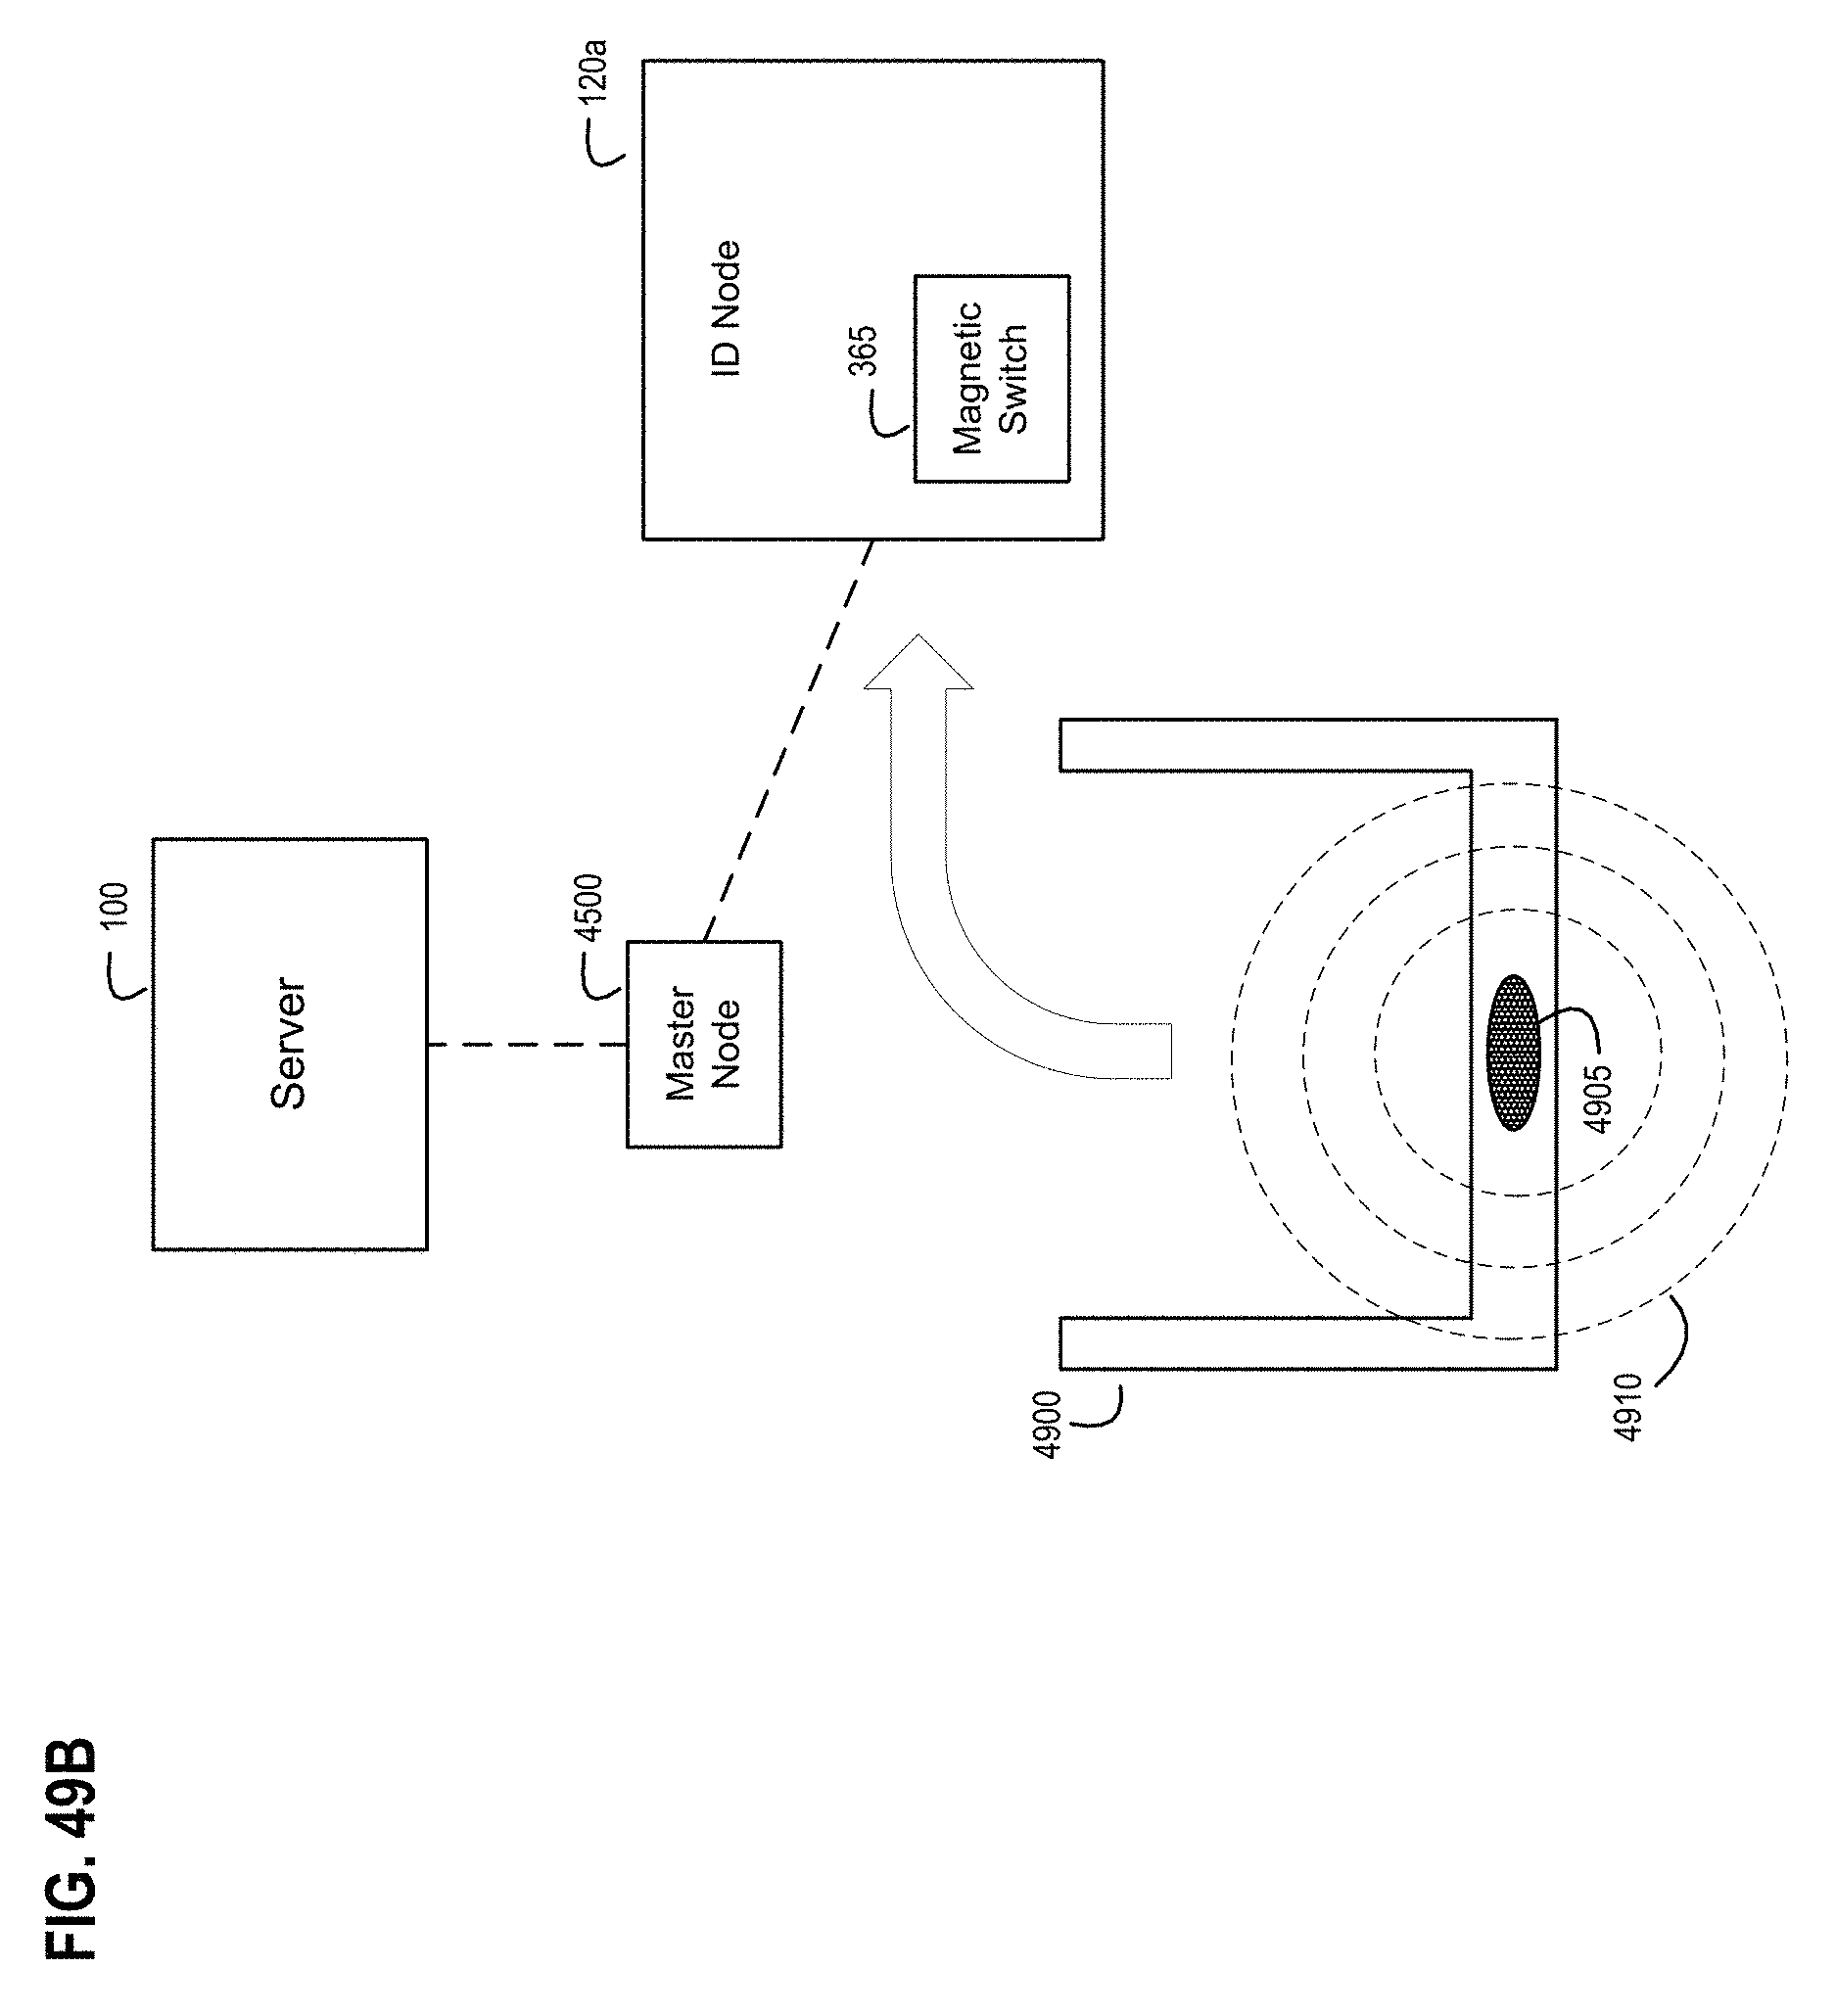 Patent US 9,854,556 B2